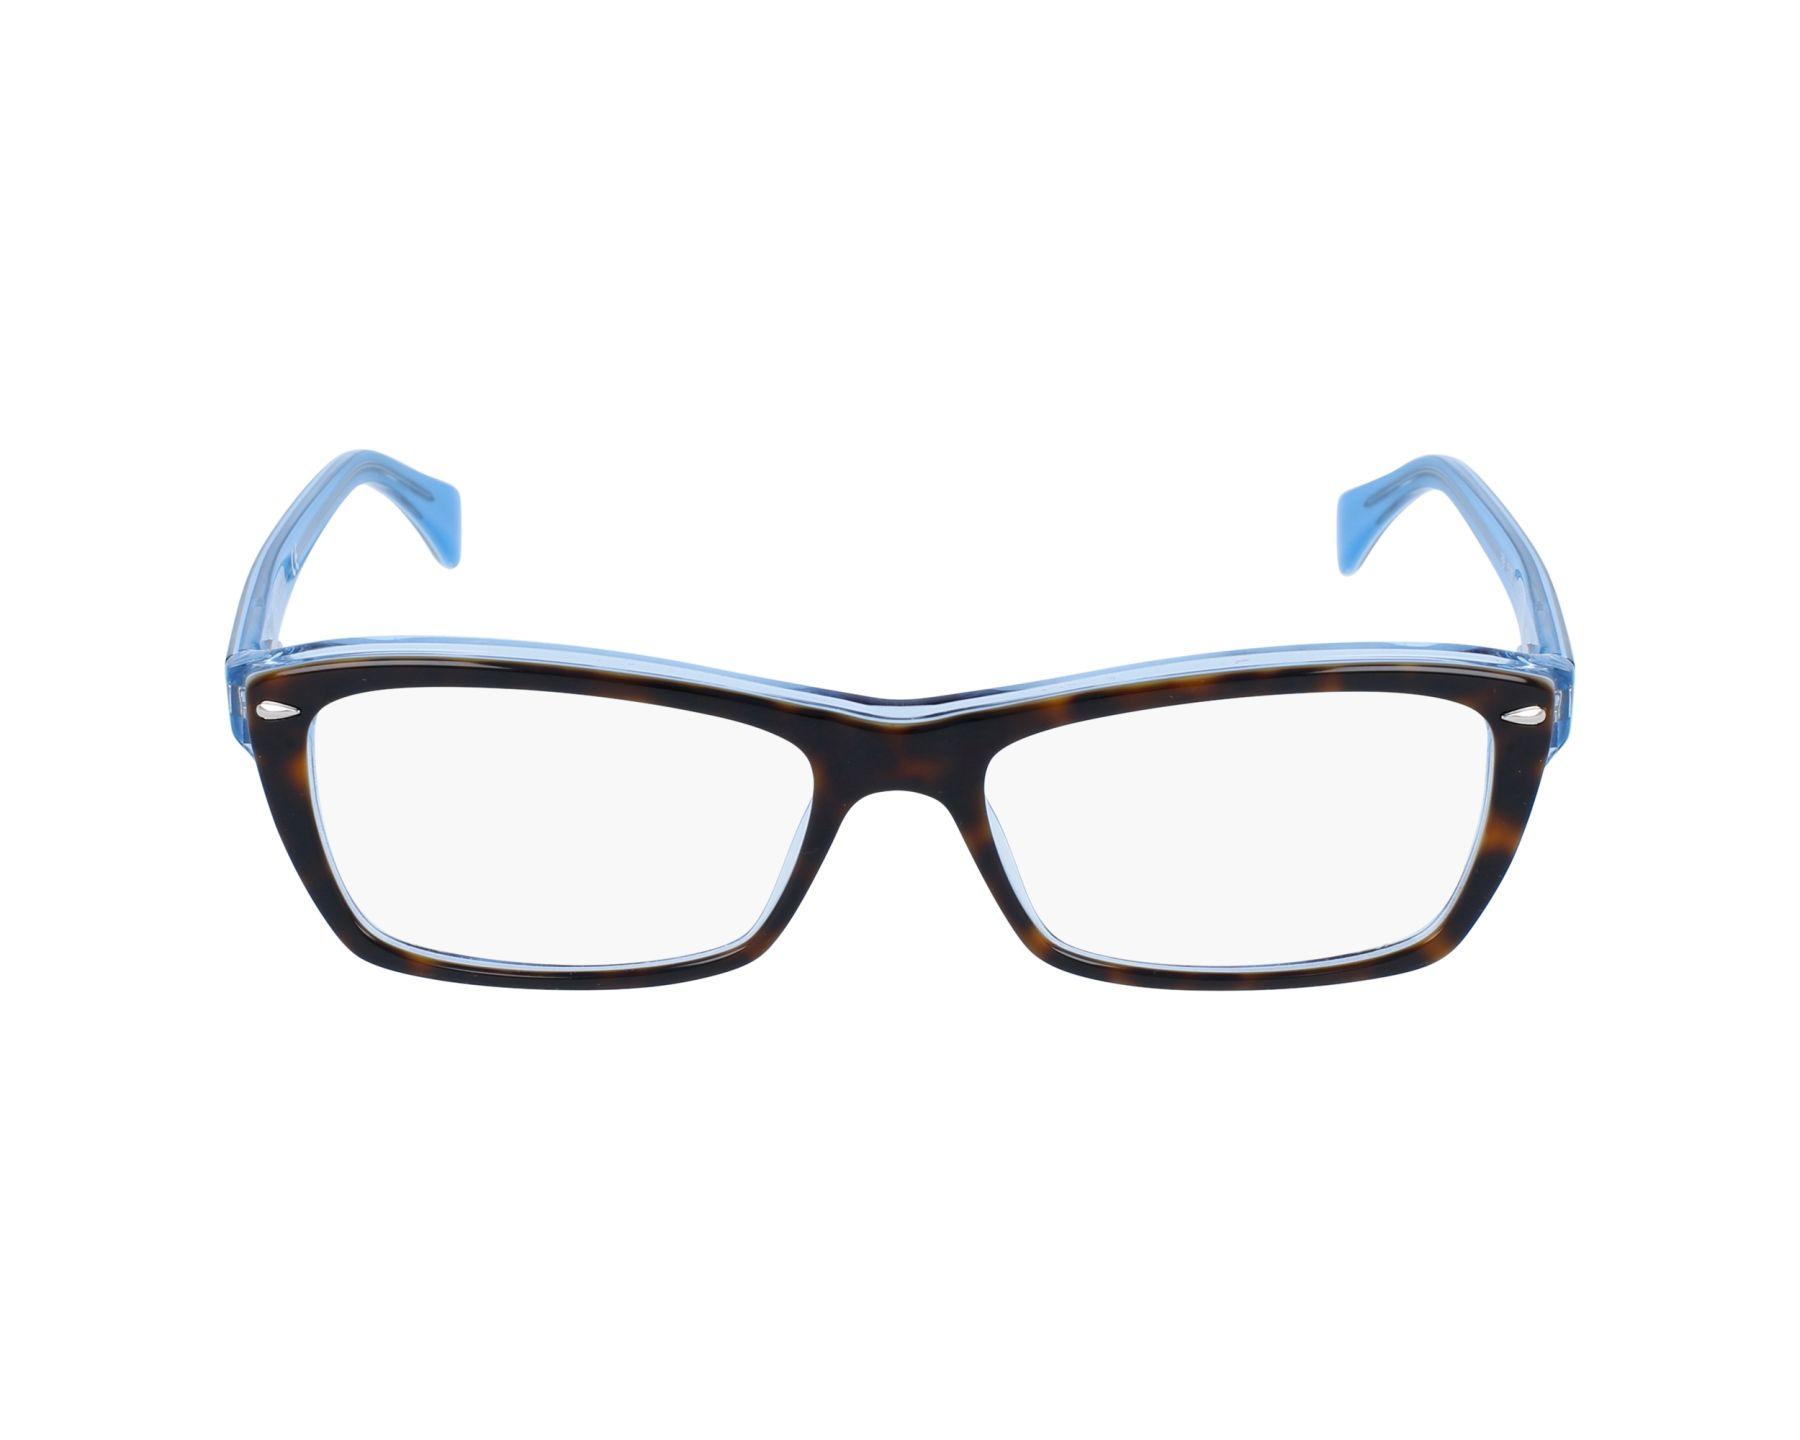 4dbb341316 Gafas Graduadas Ray-Ban RX-5255 5023 51-16 Havana Azul vista de